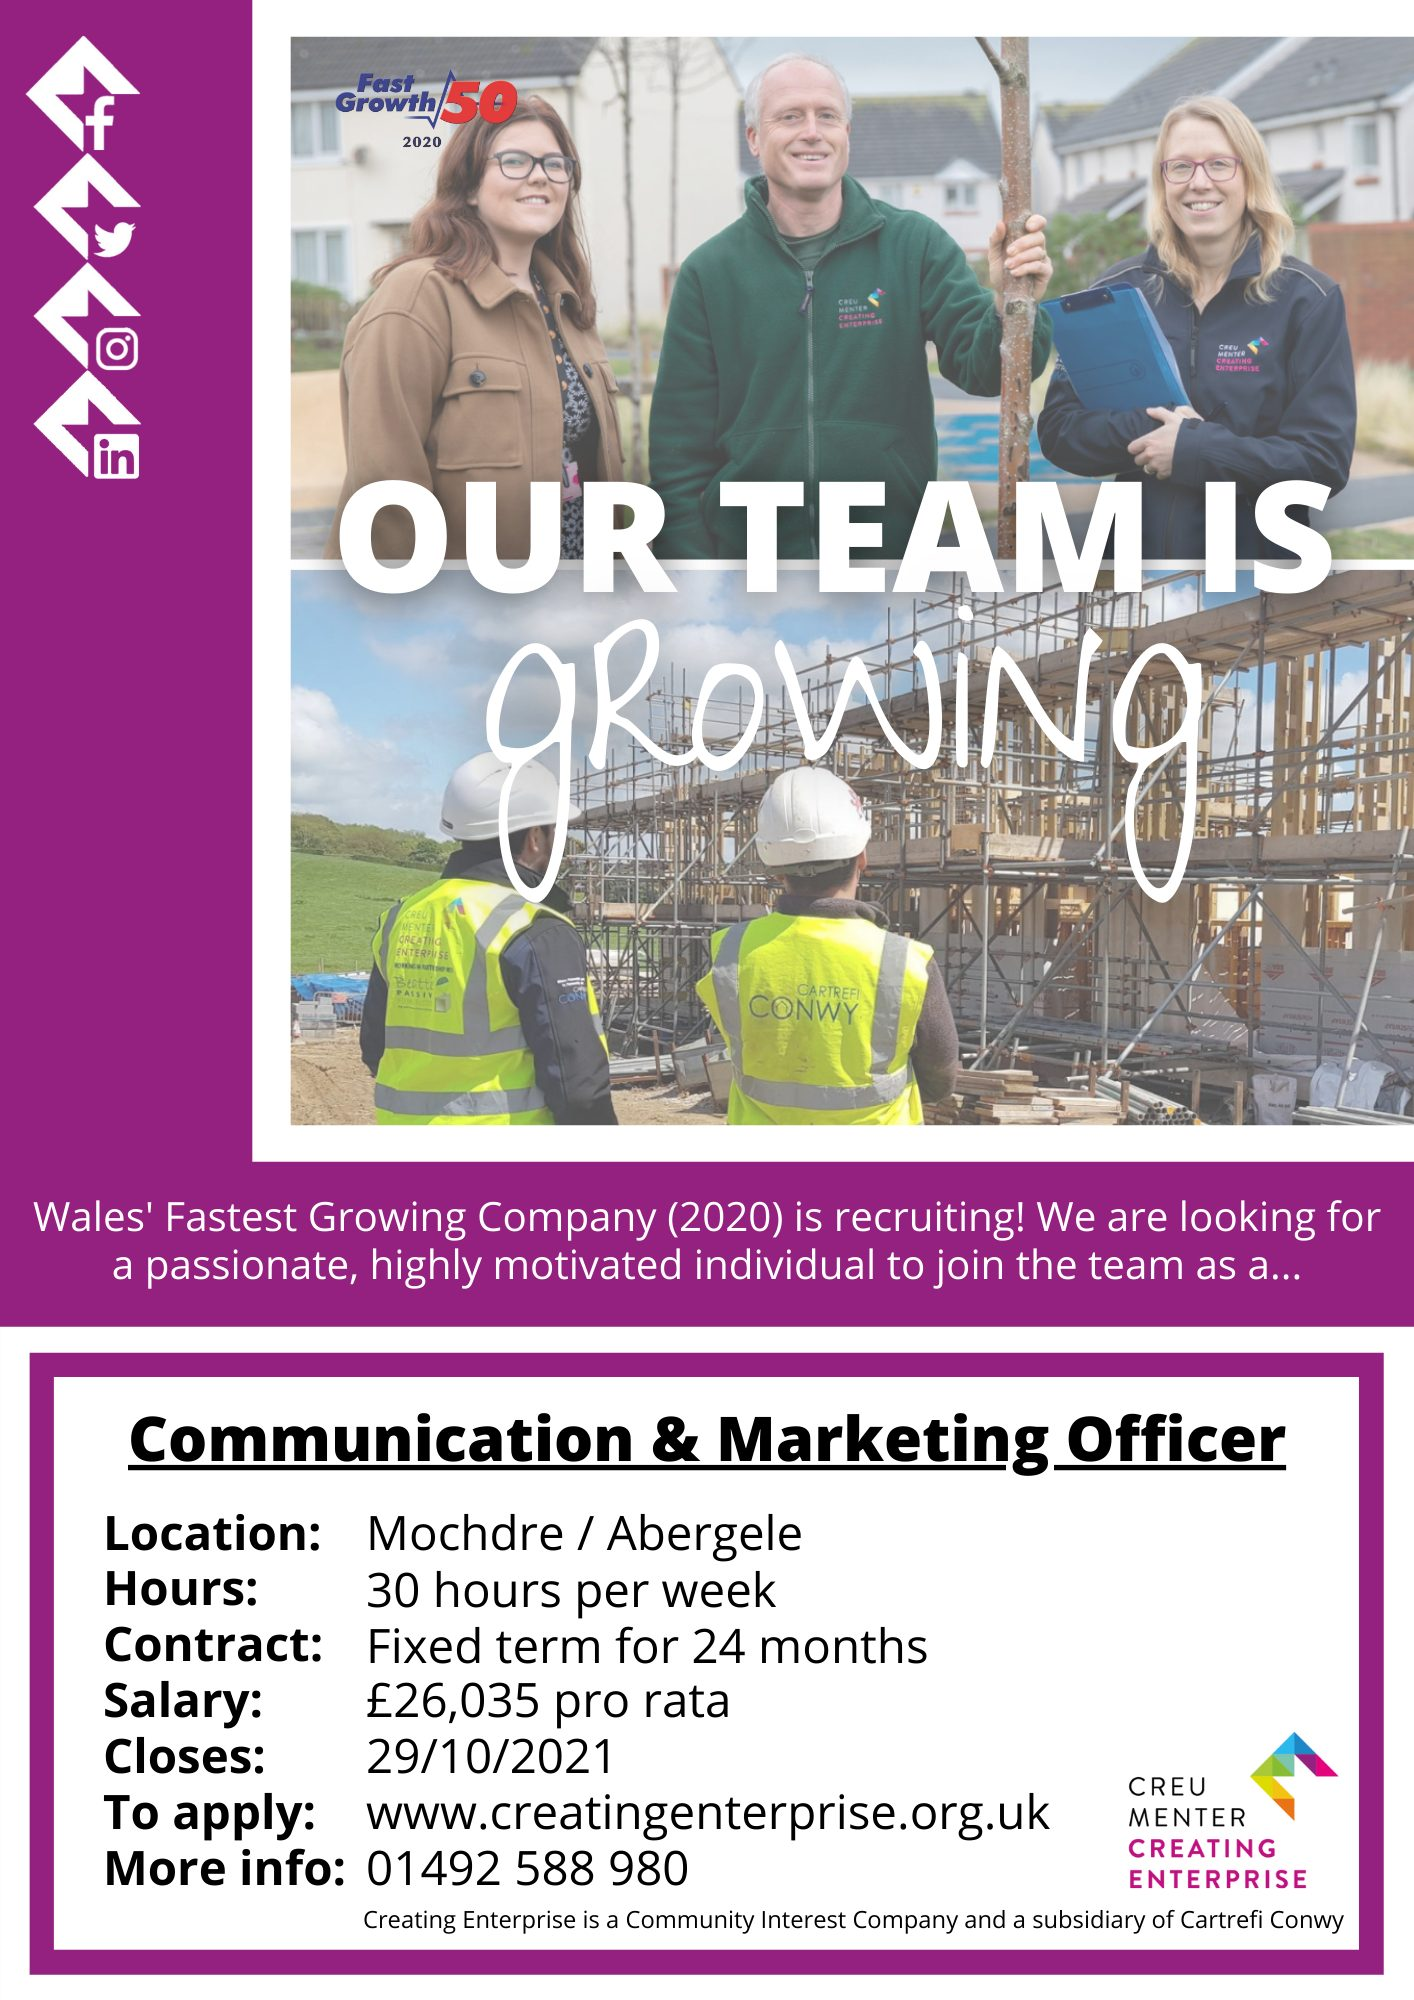 Communication & Marketing Officer